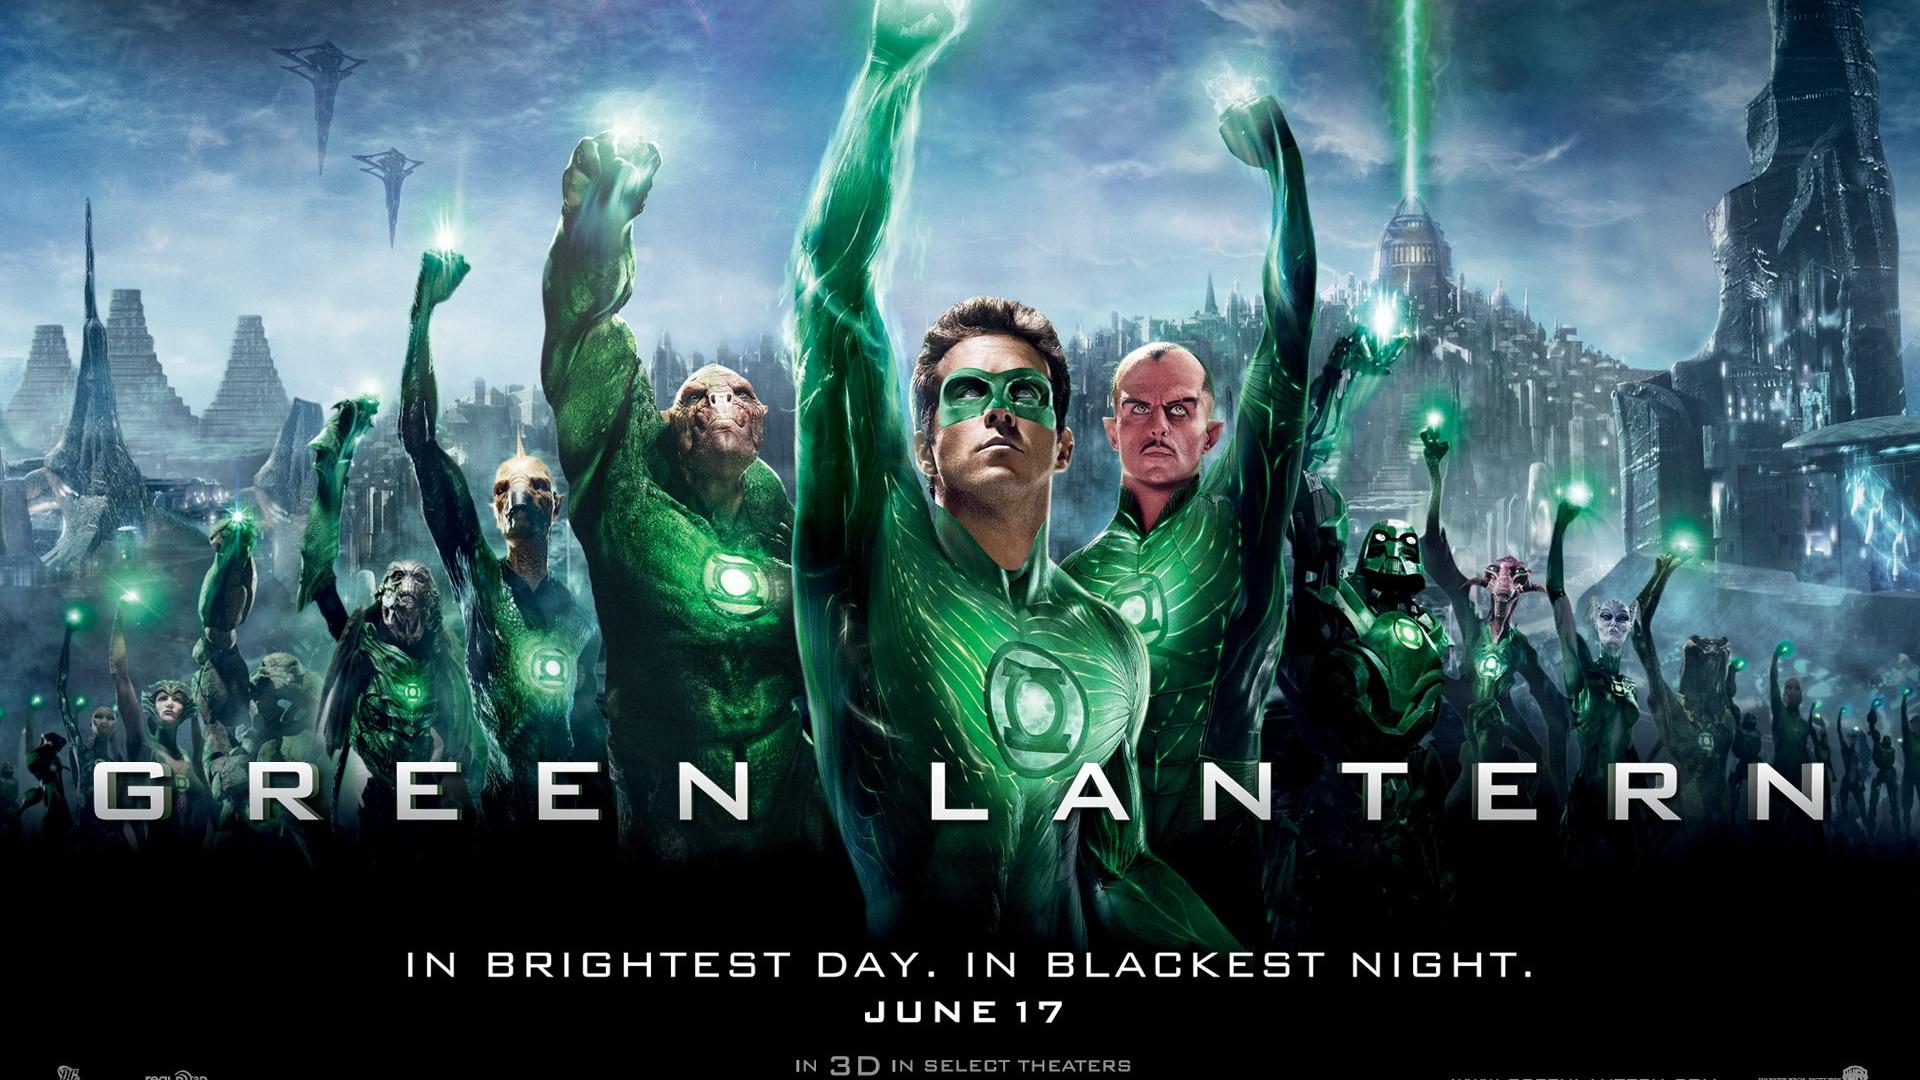 Green Lantern The Movie Wallpaper HD 2682 Wallpaper Download HD 1920x1080